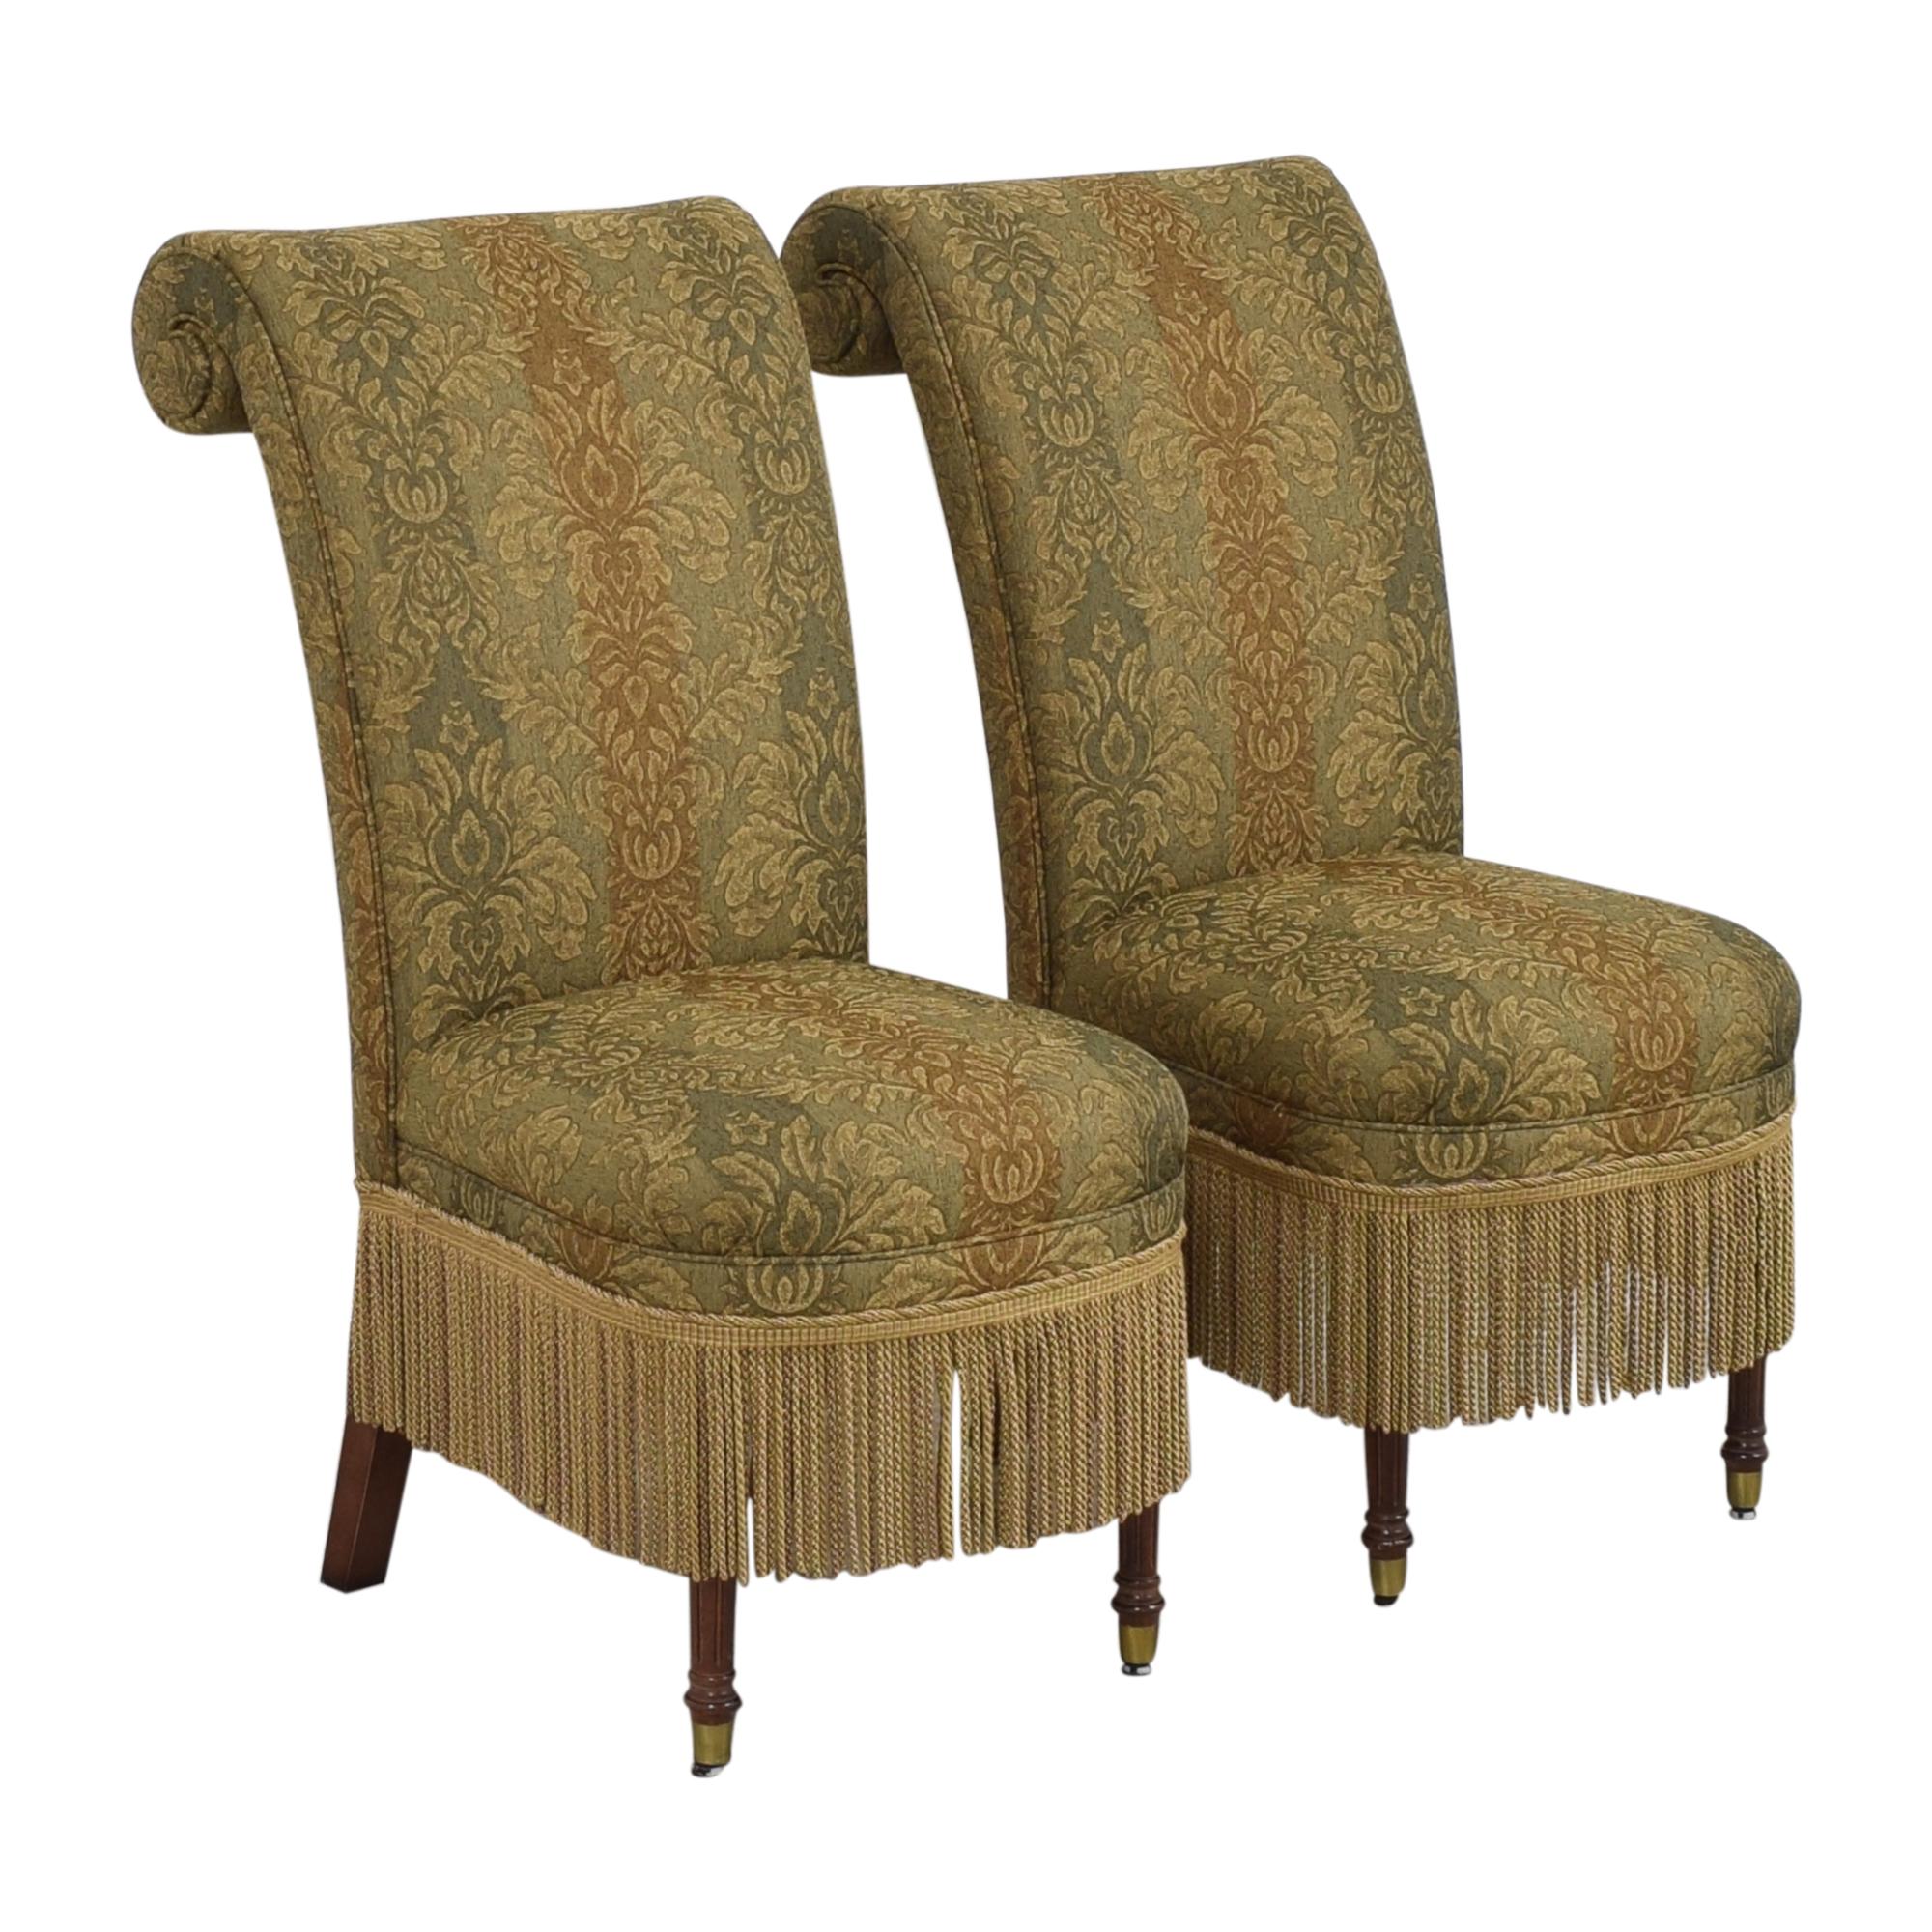 shop Designmaster Furniture Tasseled Dining Chairs Designmaster Furniture Dining Chairs